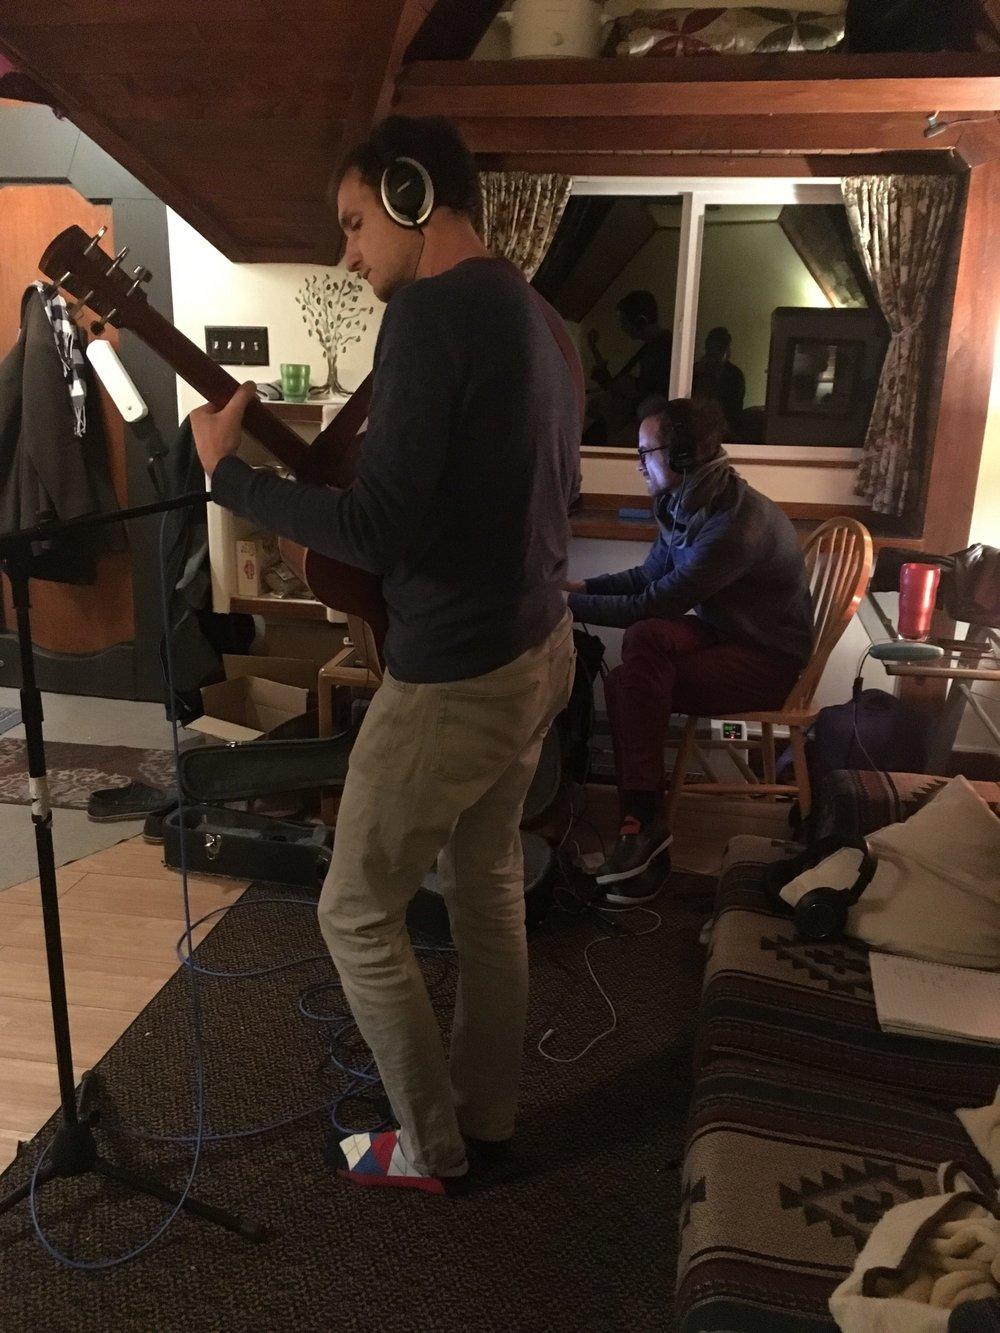 Chimney-Choir_s-Kevin-Larkin-and-David-Rynhart-rehearsing-for-Garrett-Ammon_s-Aphrodite_s-Switchboard.jpeg